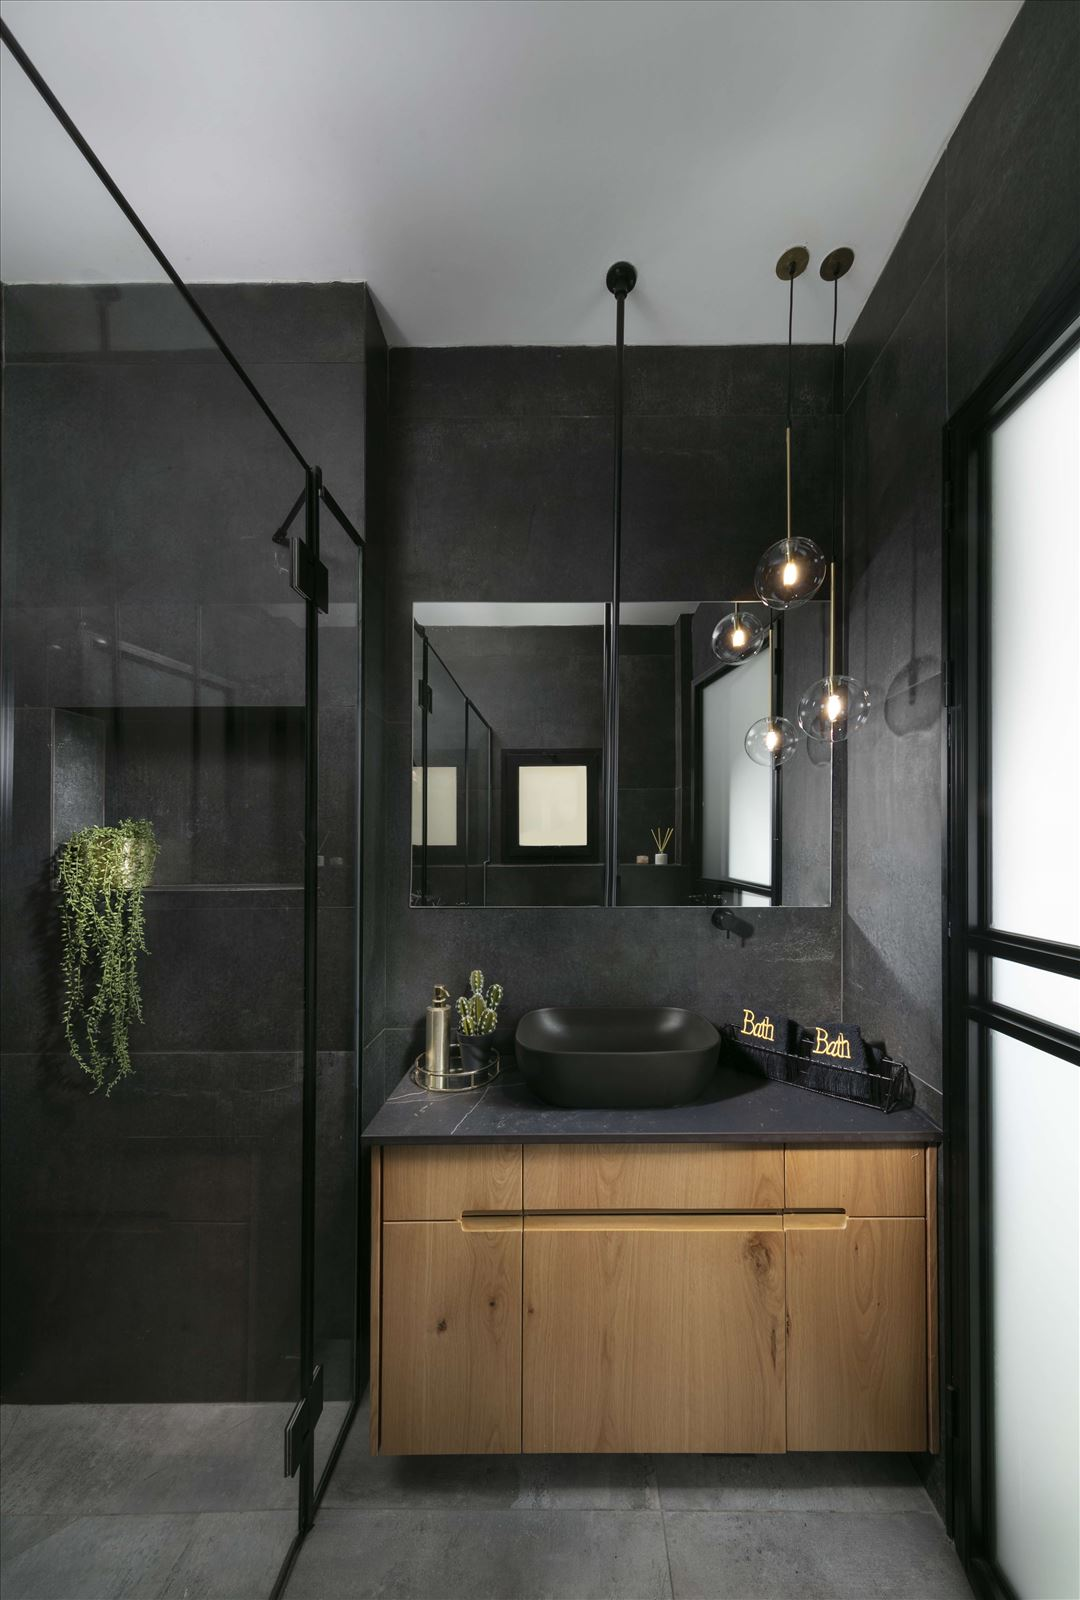 Lighting project private house תאורה בחדר הרחצה נעשתה על ידי דורי קמחי